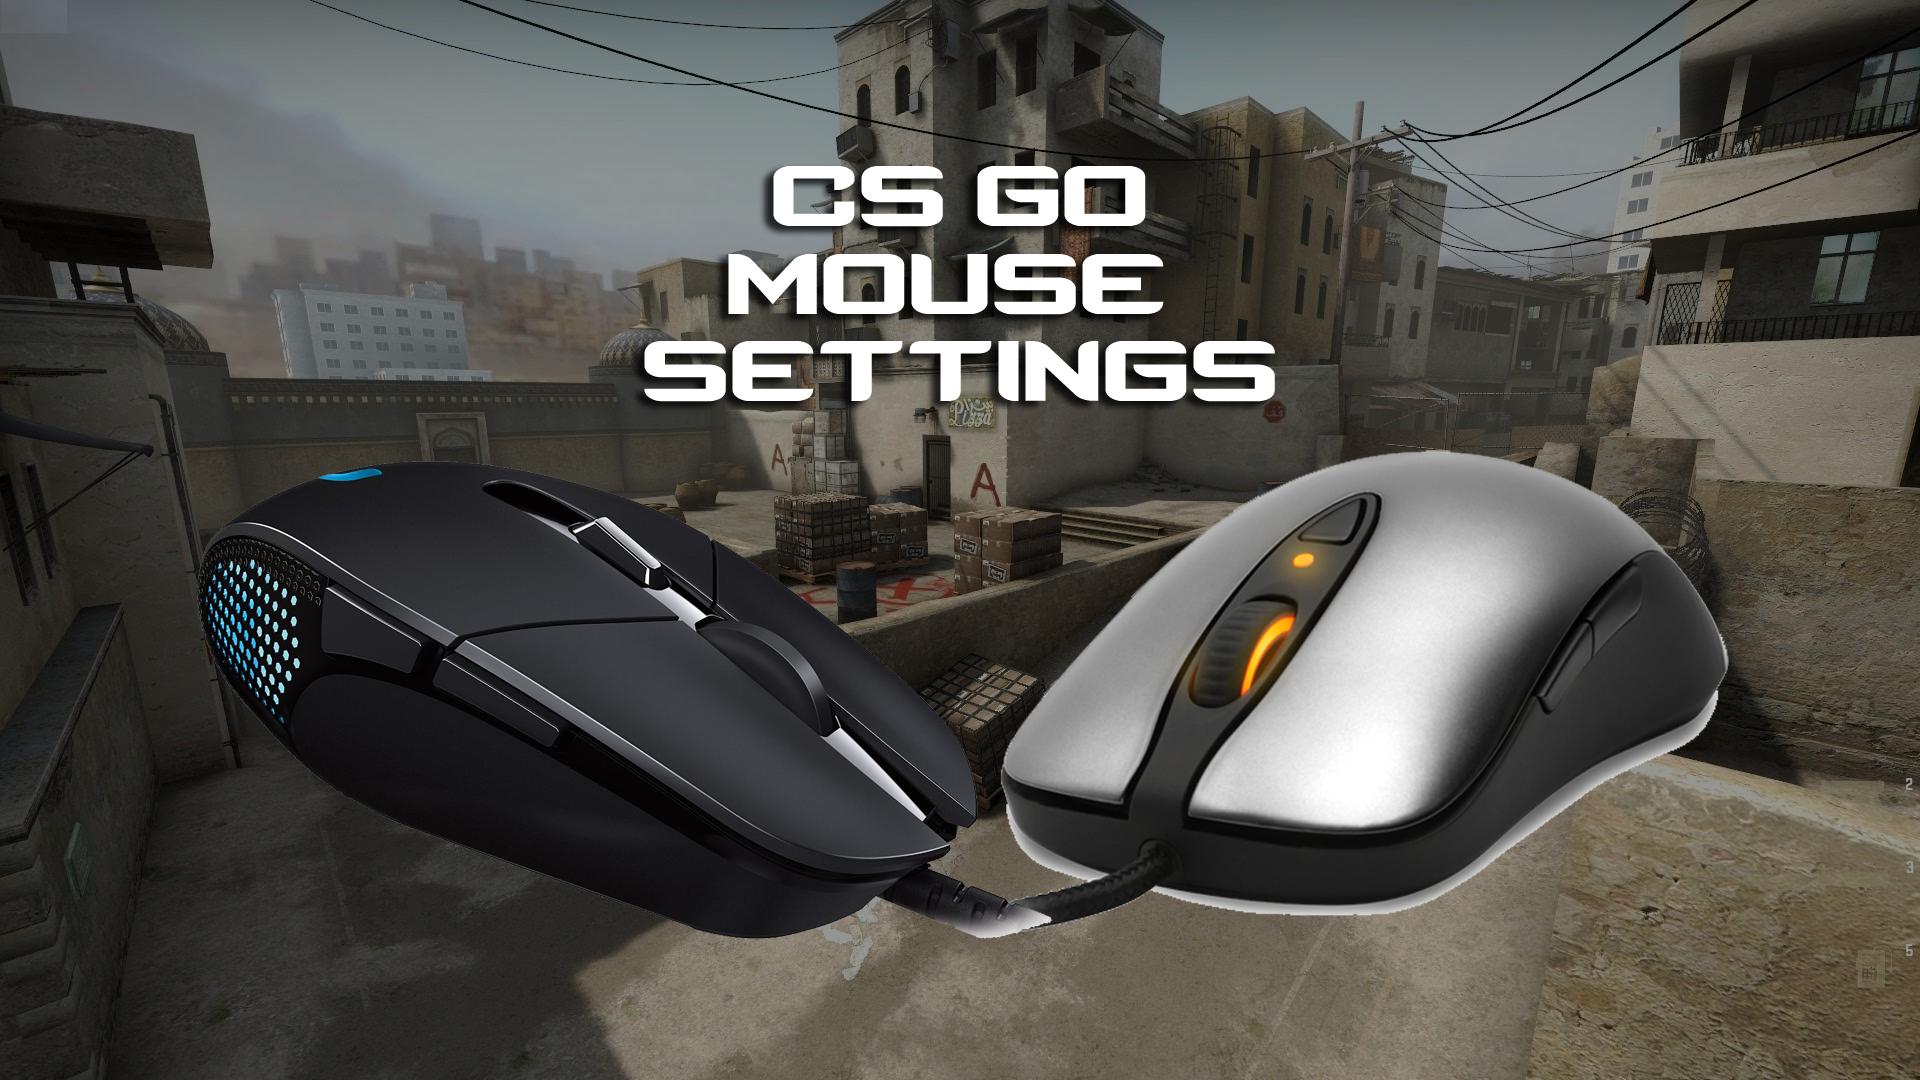 CS GO PRO Players mouse sensitivity settings - CS-GO Eagles